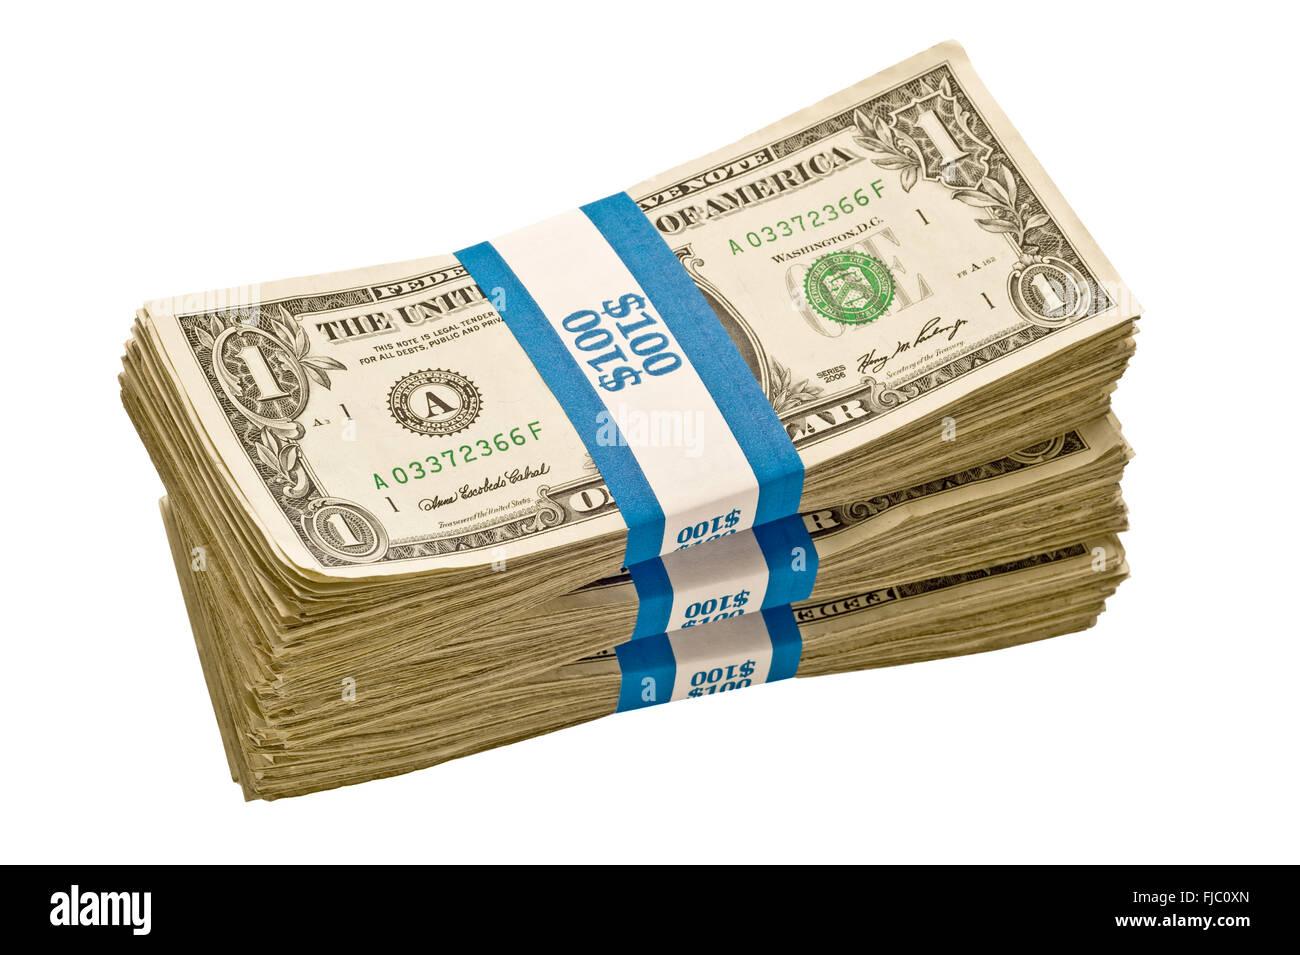 Bundles of Dollar Bills - Stock Image